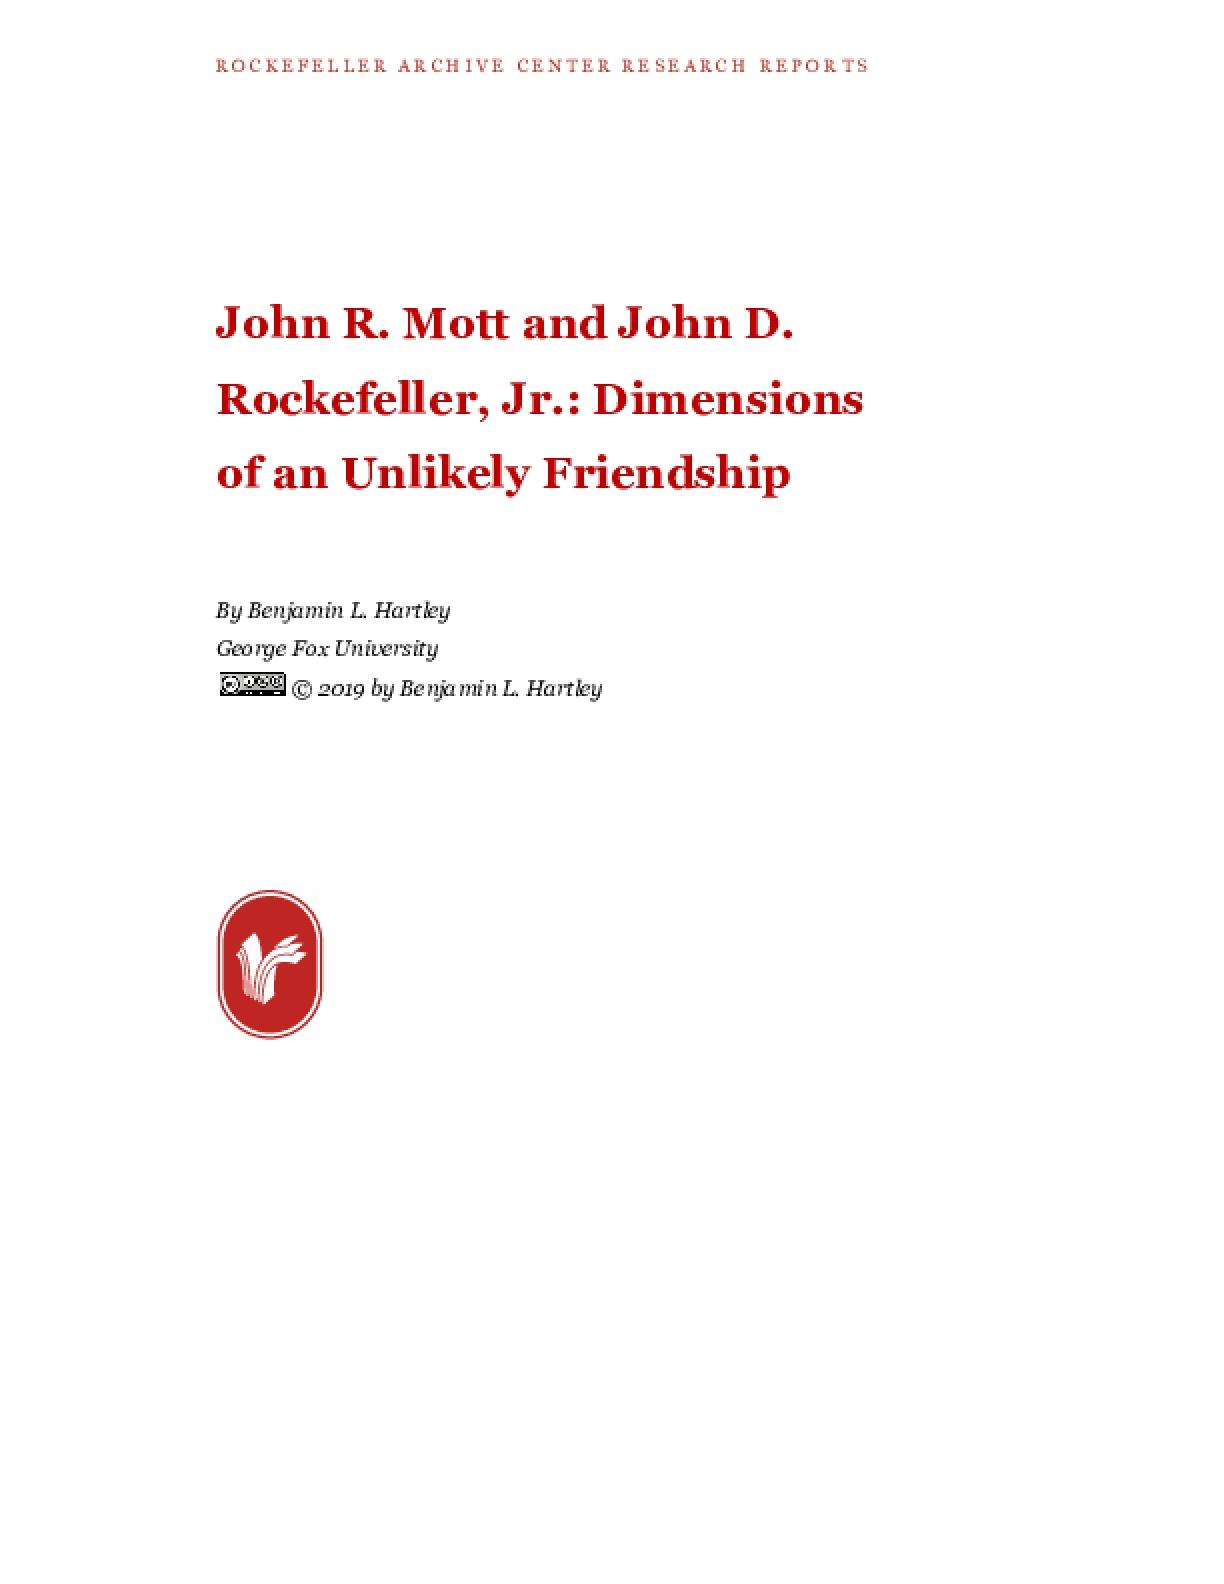 John R. Mott and John D. Rockefeller, Jr.: Dimensions of an Unlikely Friendship